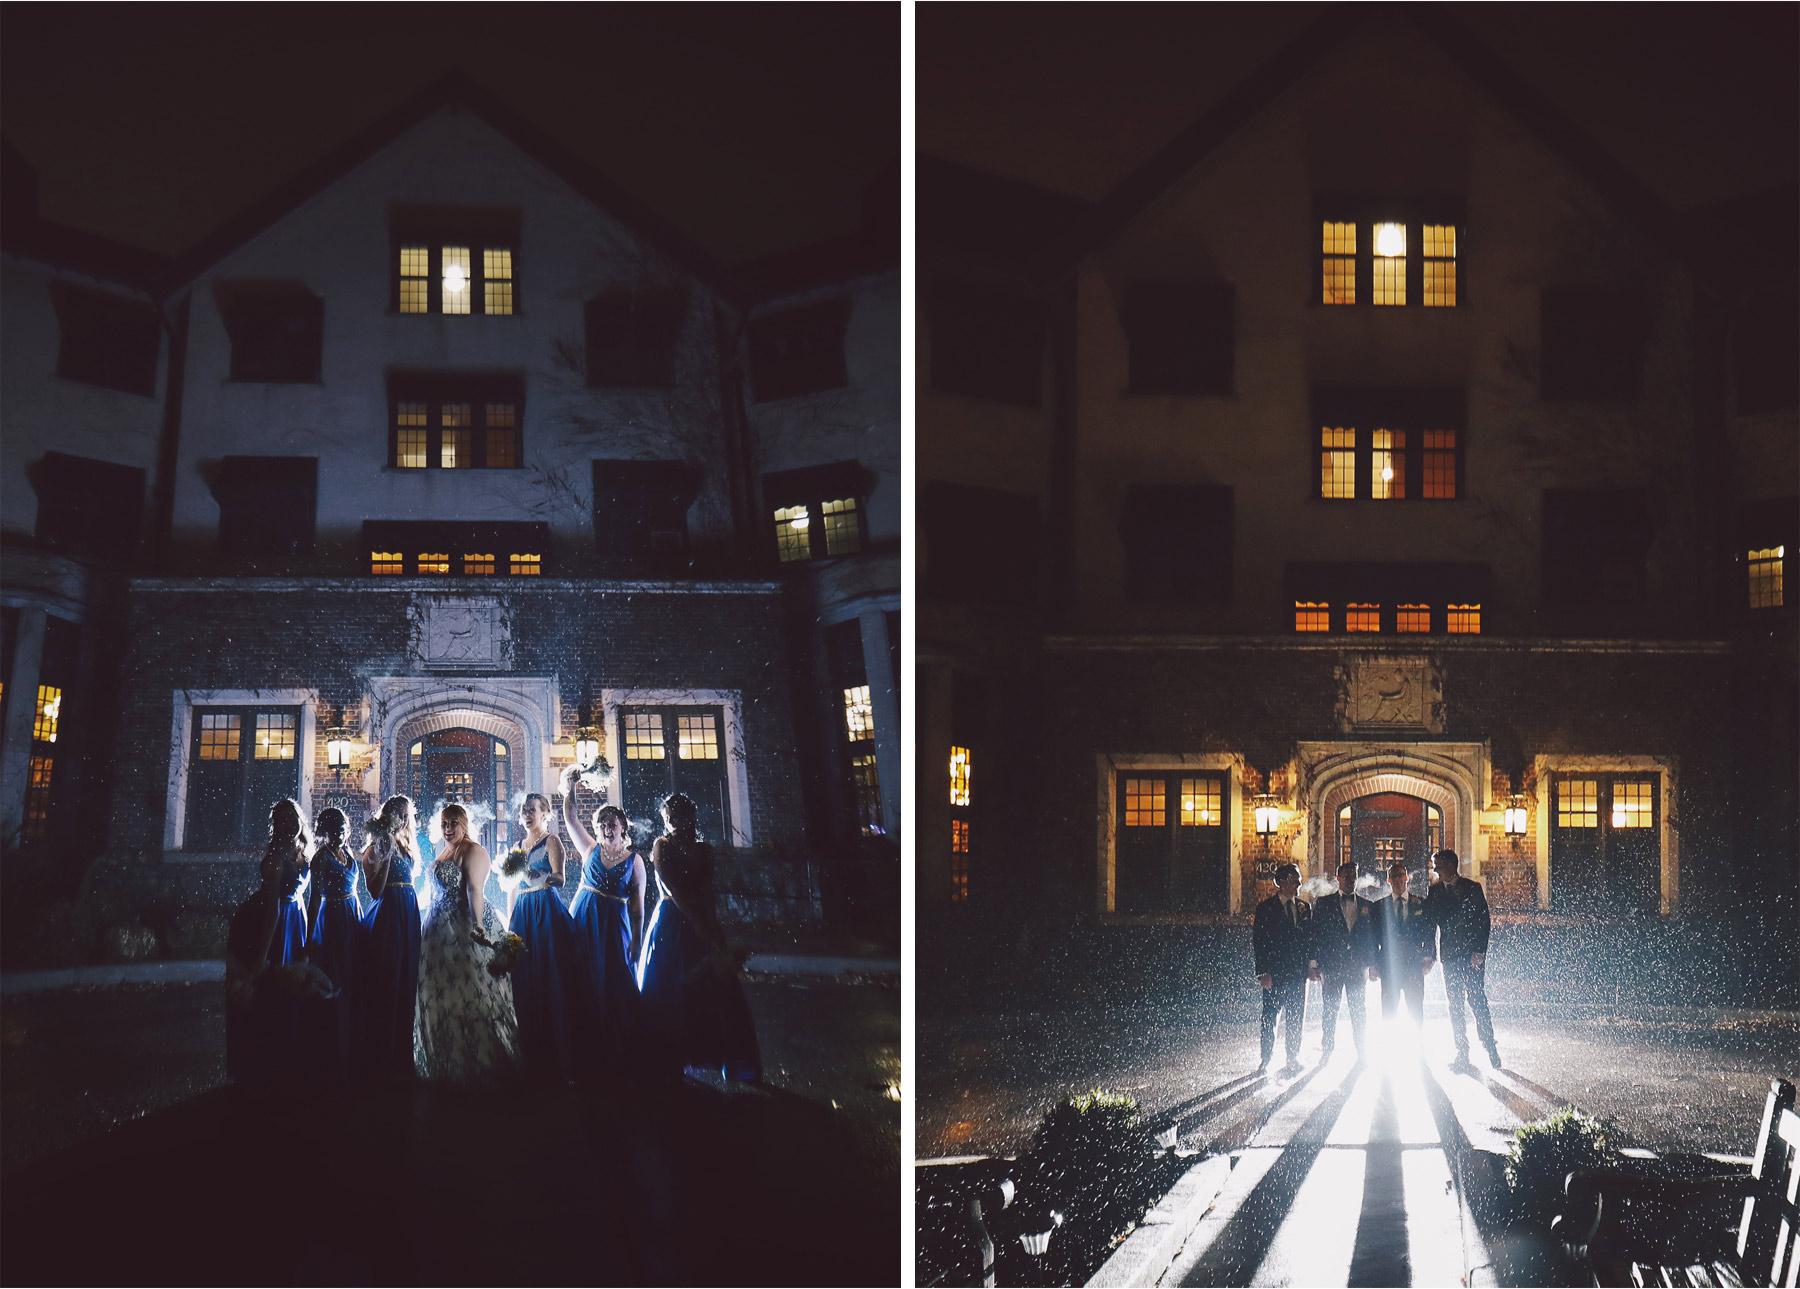 15-Saint-Paul-Minnesota-Wedding-Photography-by-Vick-Photography-The-University-Club-Night-Photography-Rain-Umbrella-Bridesmaids-Groomsmen-Mari-and-Giuseppe.jpg